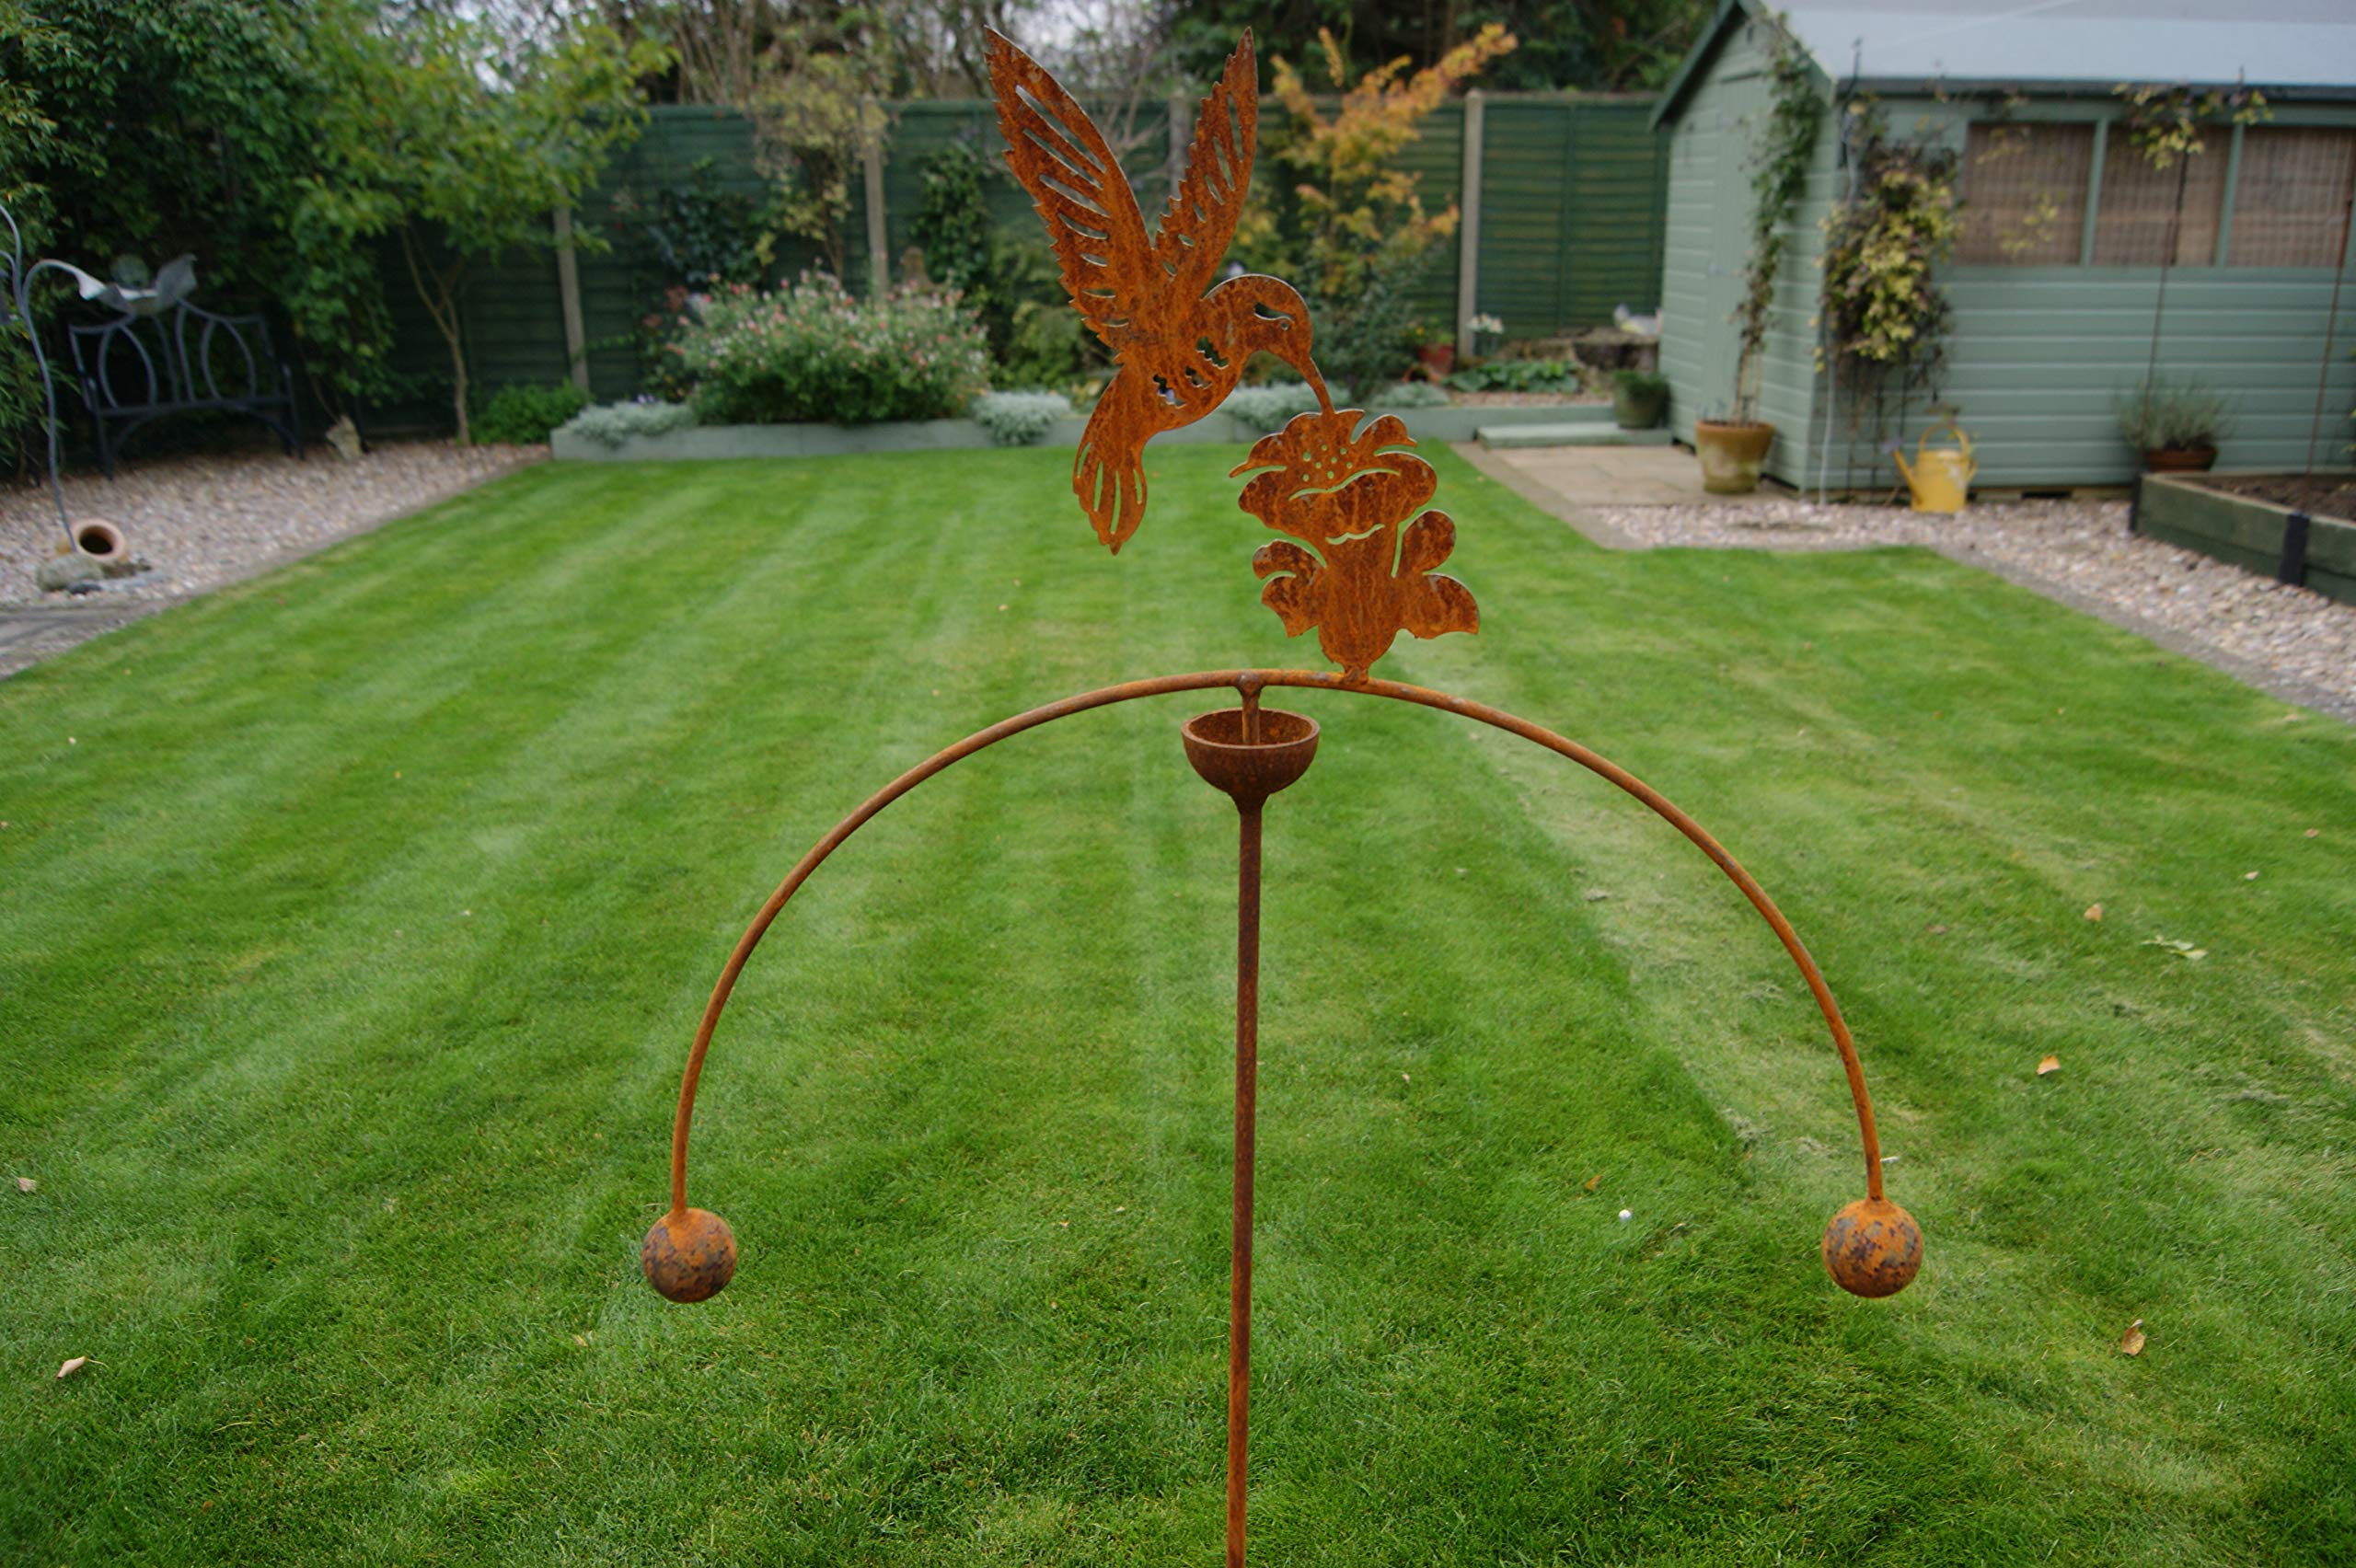 GAP Garden Products Spitfire Single Ball Wind Rocker